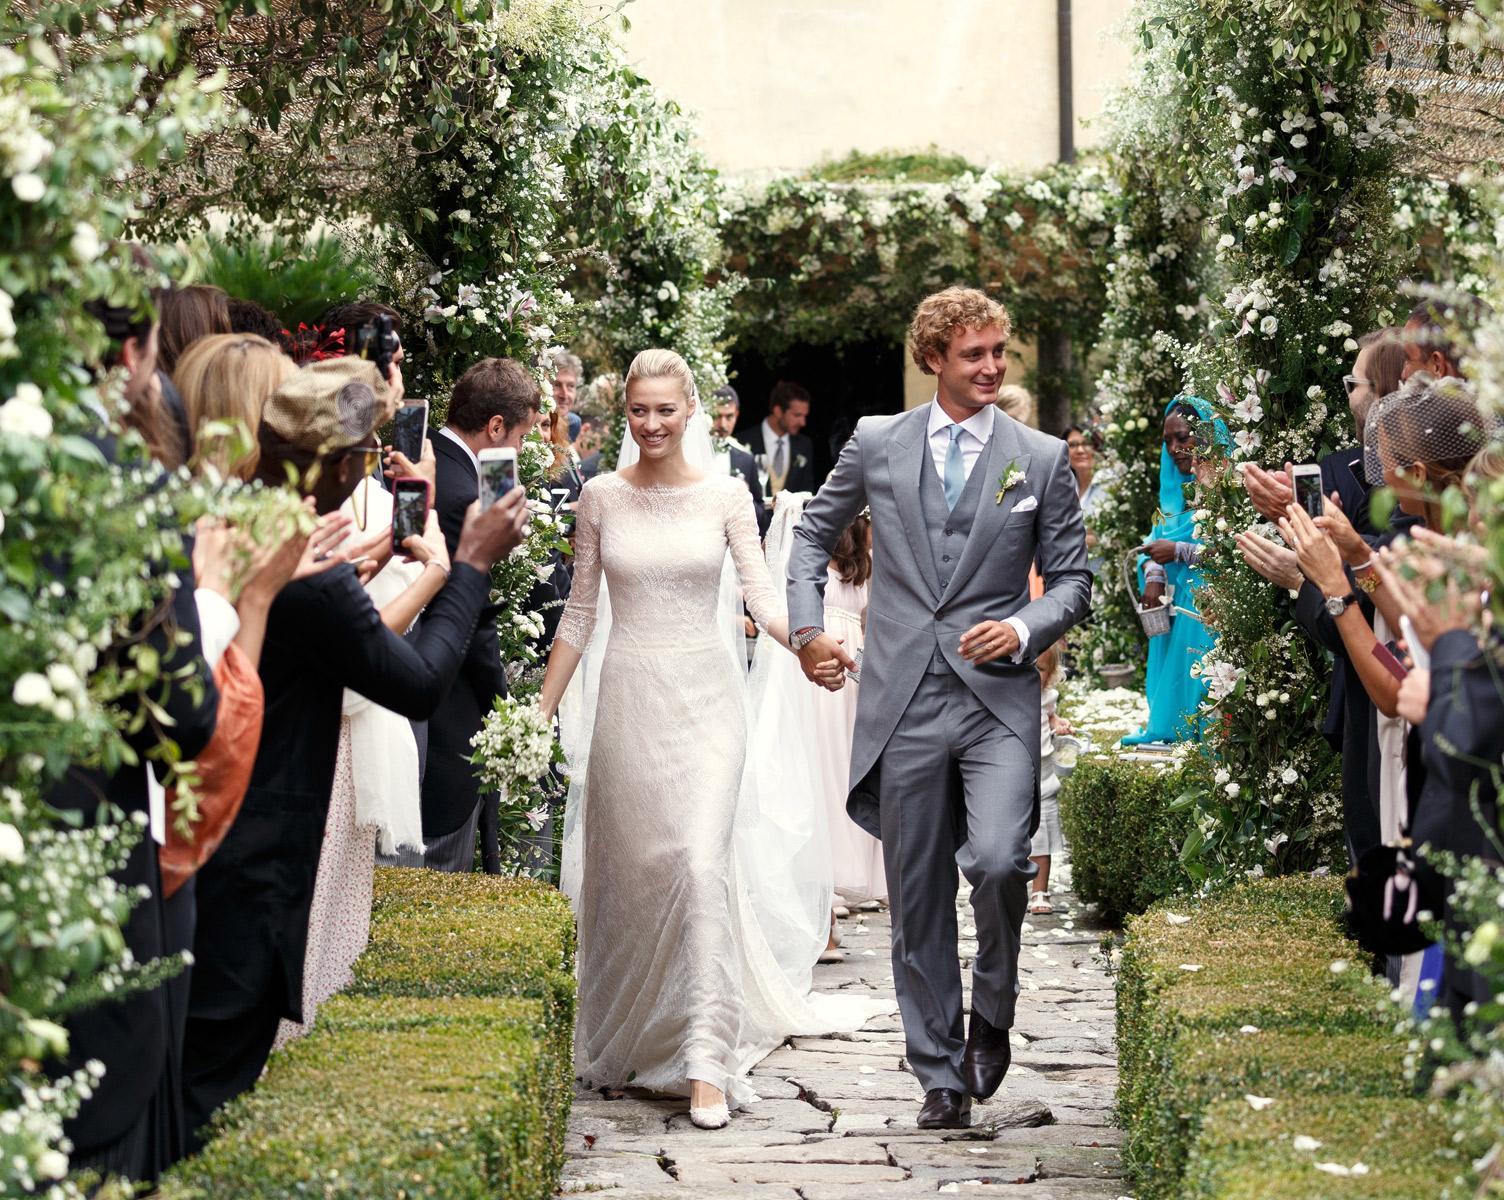 Check out all 5 of @BorromeoBea's wedding dresses @MaisonValentino @armani http://t.co/grhrXNfCdS http://t.co/oYcFrVxLGJ